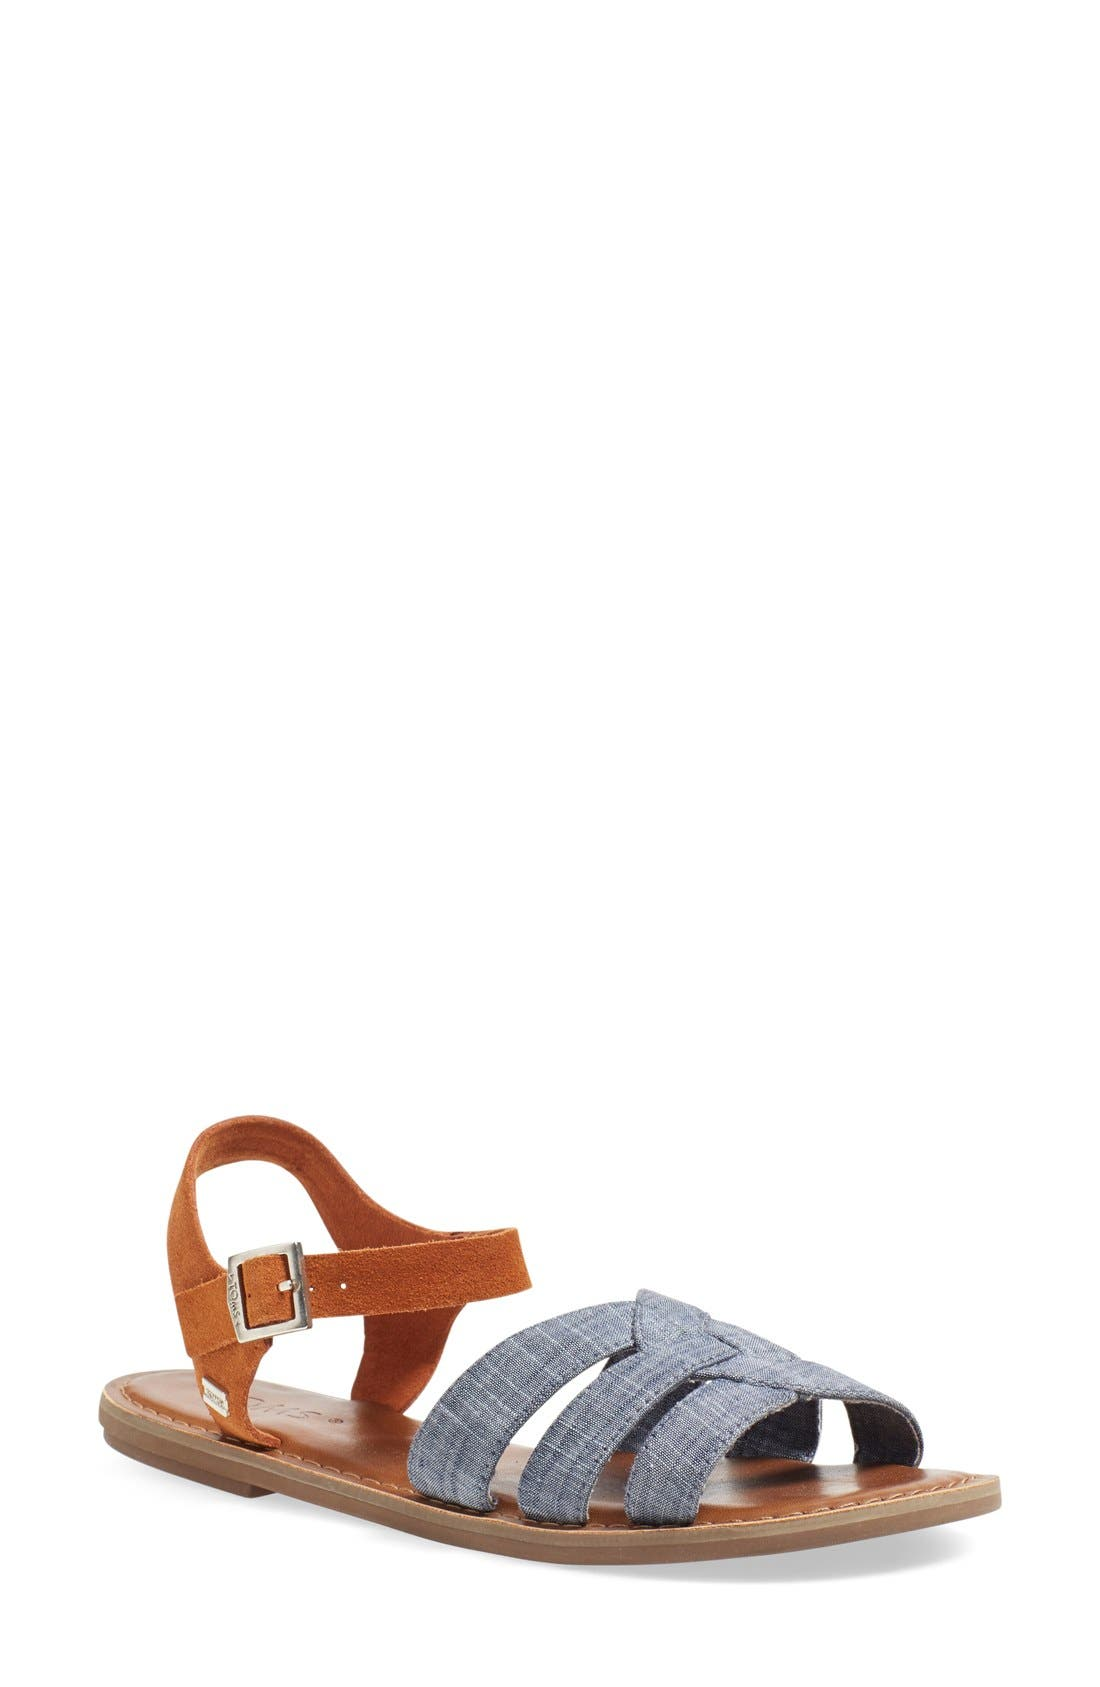 Alternate Image 1 Selected - TOMS 'Zoe' Chambray Flat Quarter Strap Sandal (Women)